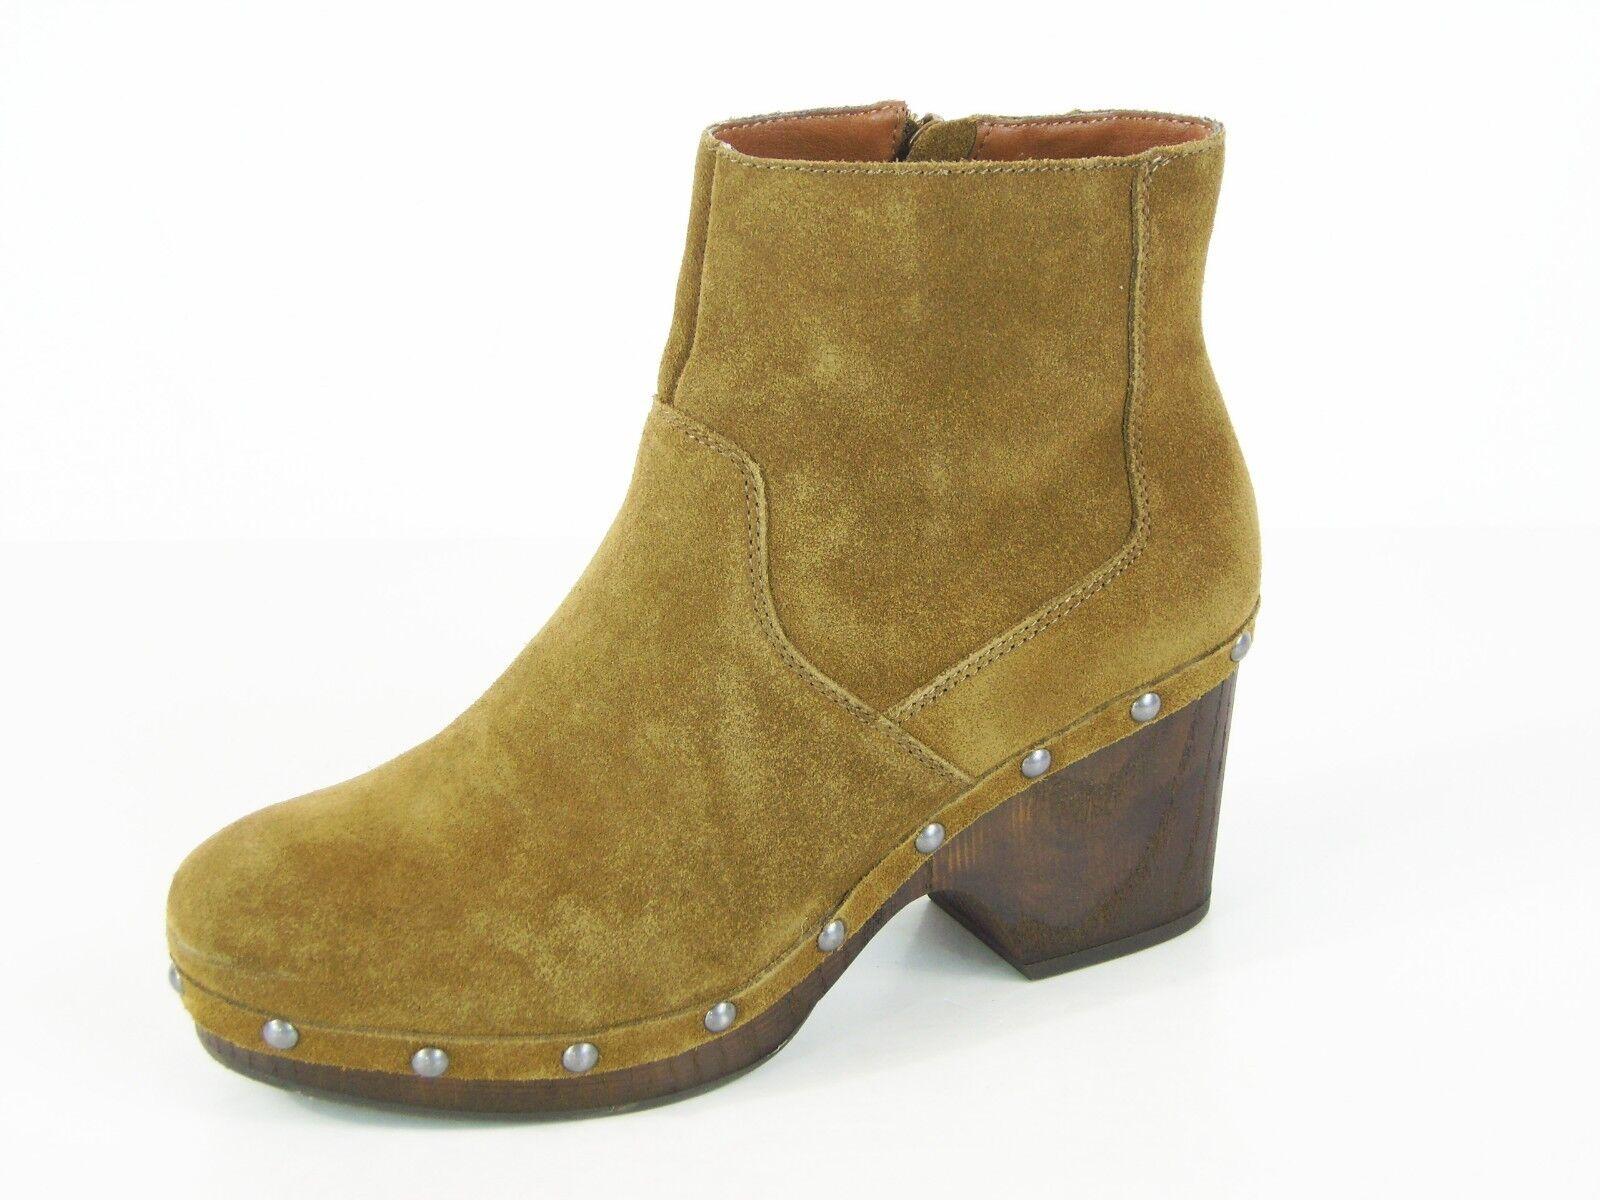 Lucky Brand Yasamin Stiefelie - Tapenade Suede - - - Sz 9 M; 39 EU 704488